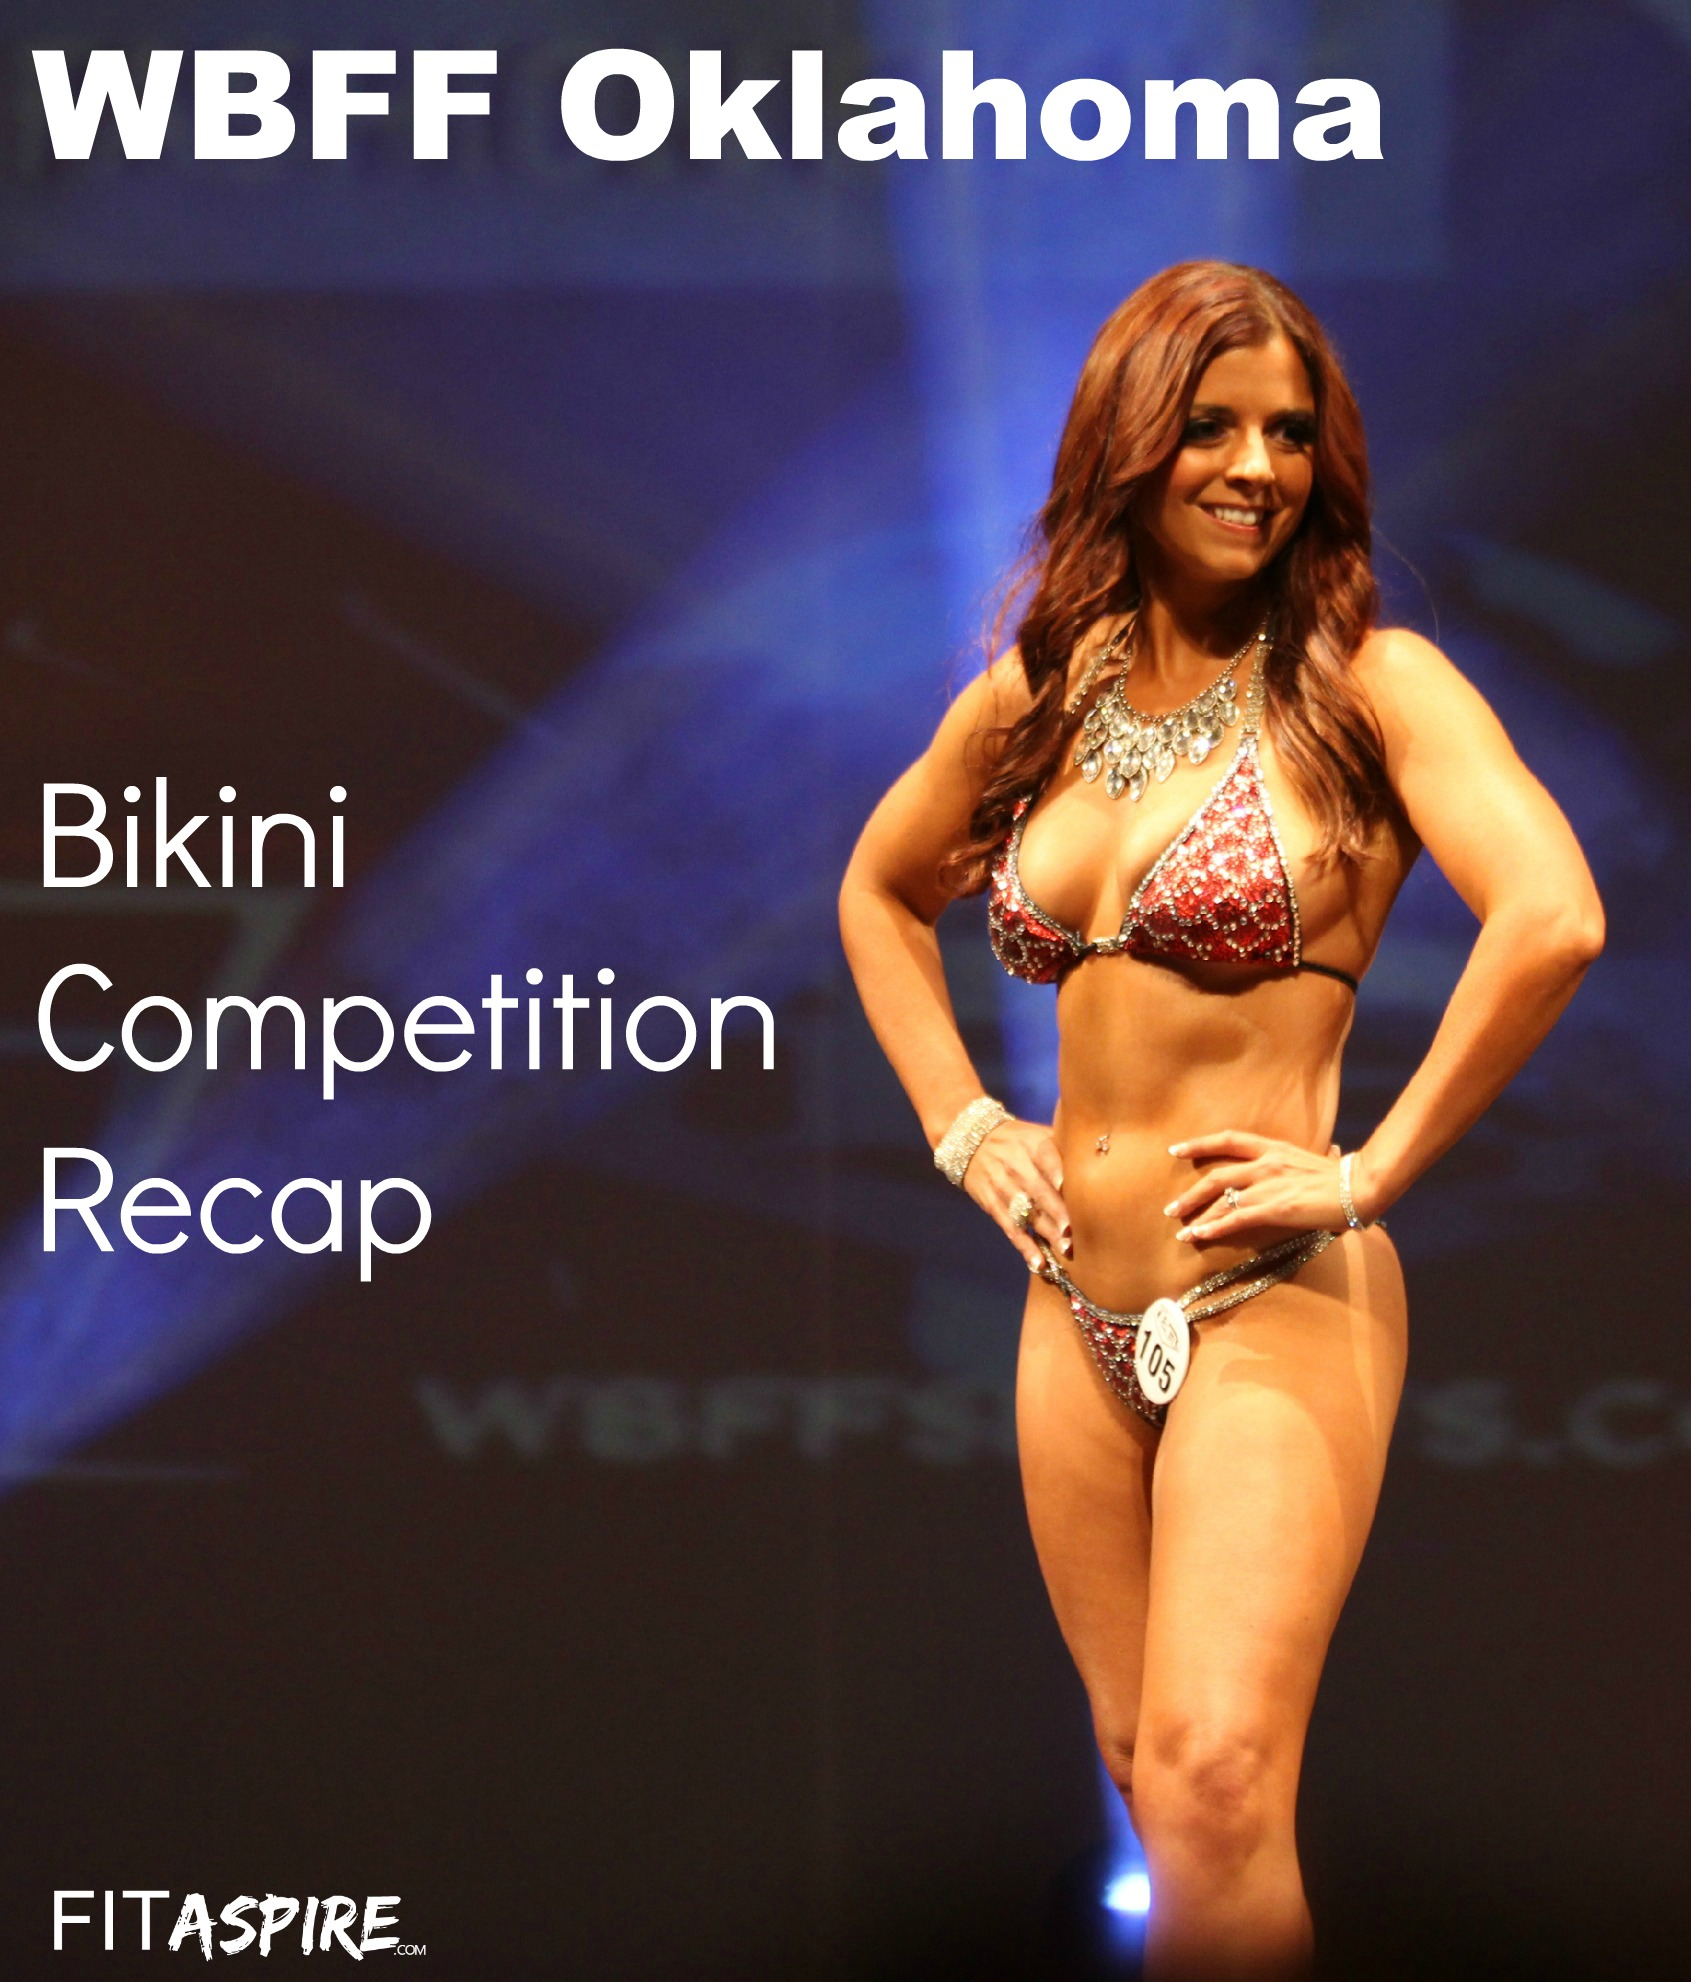 WBFF Oklahoma: Bikini Competition Recap